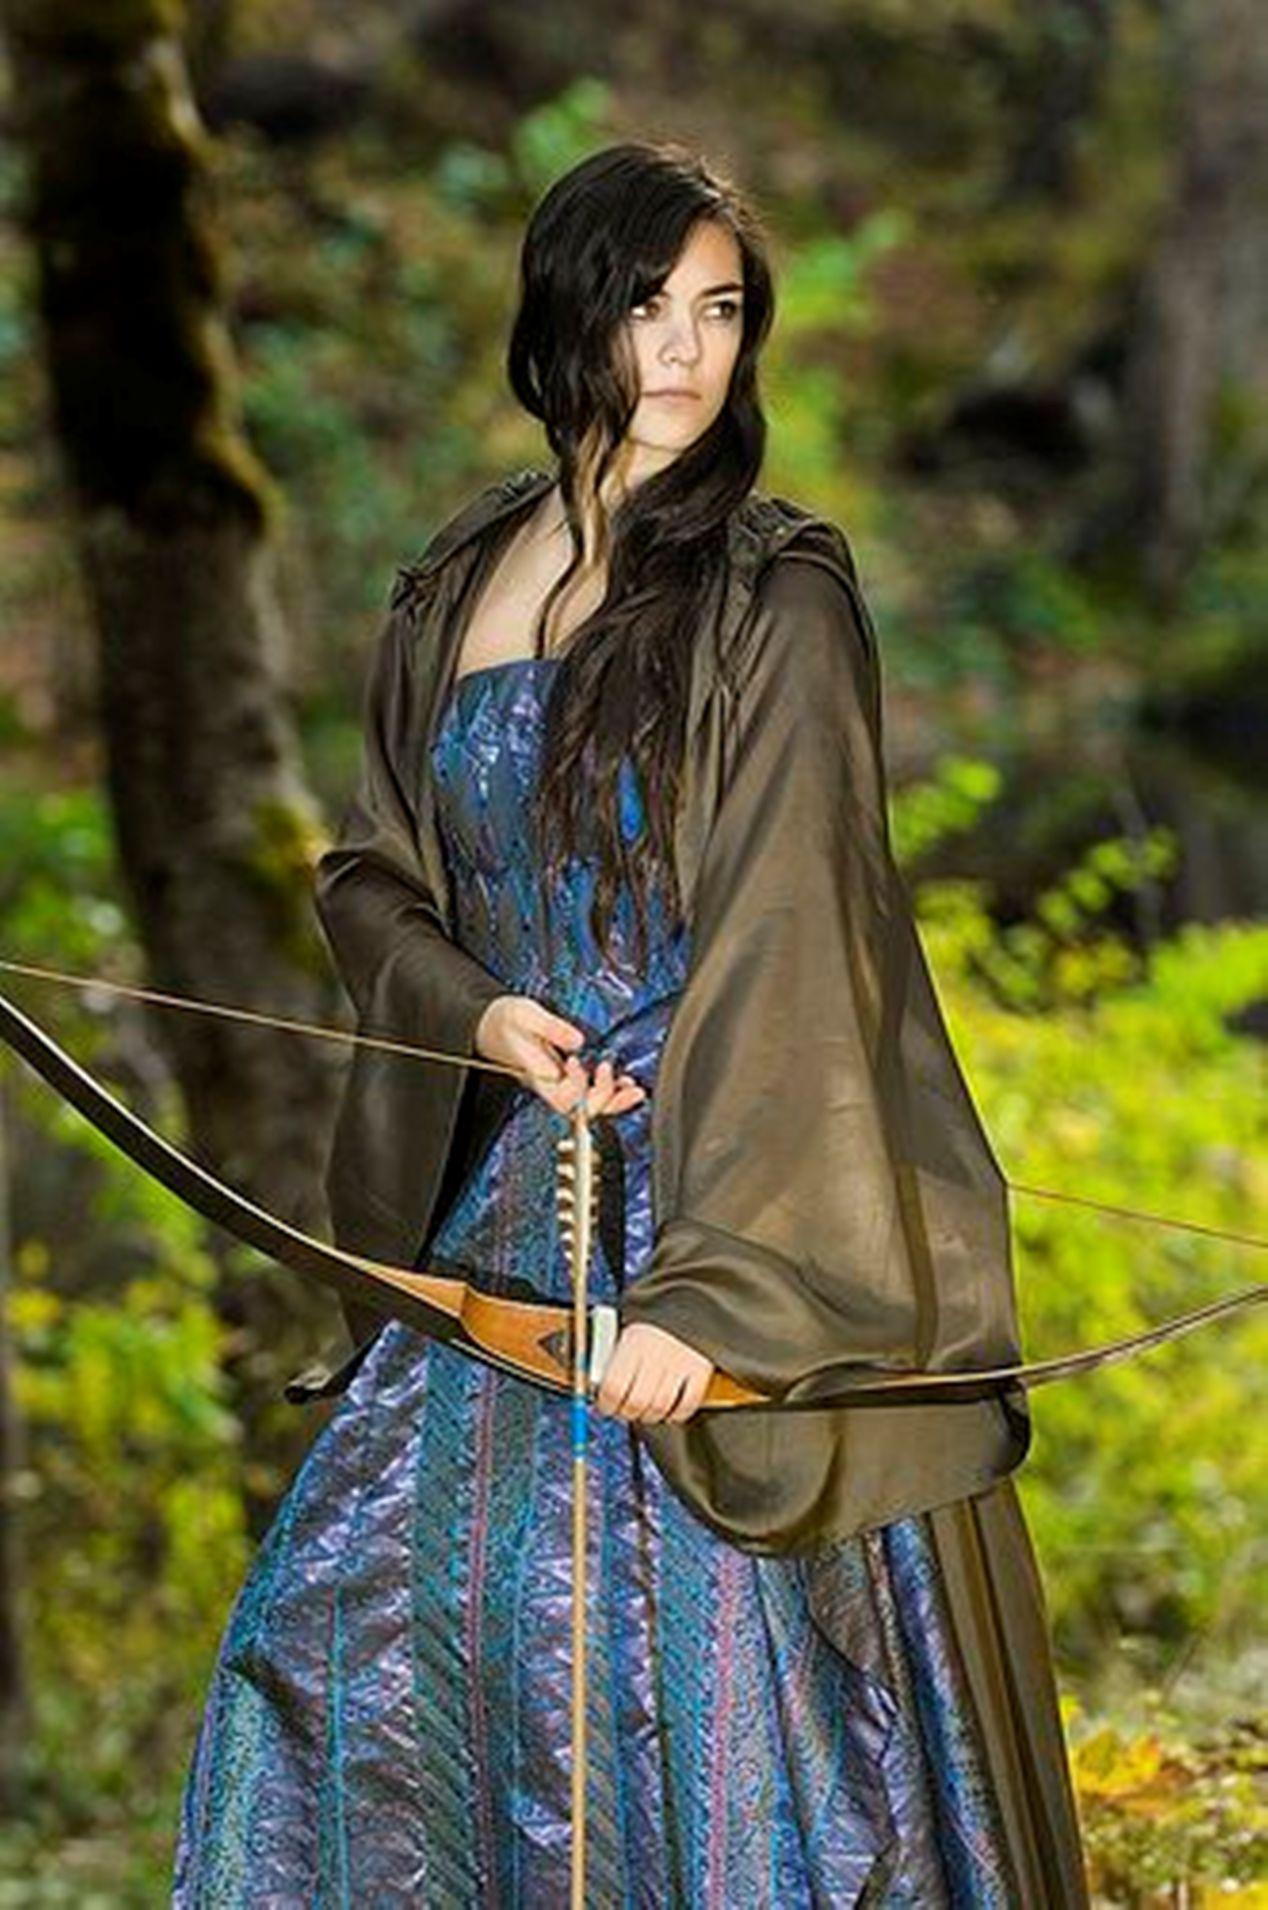 artemis girls costume. artemis goddess girls costume